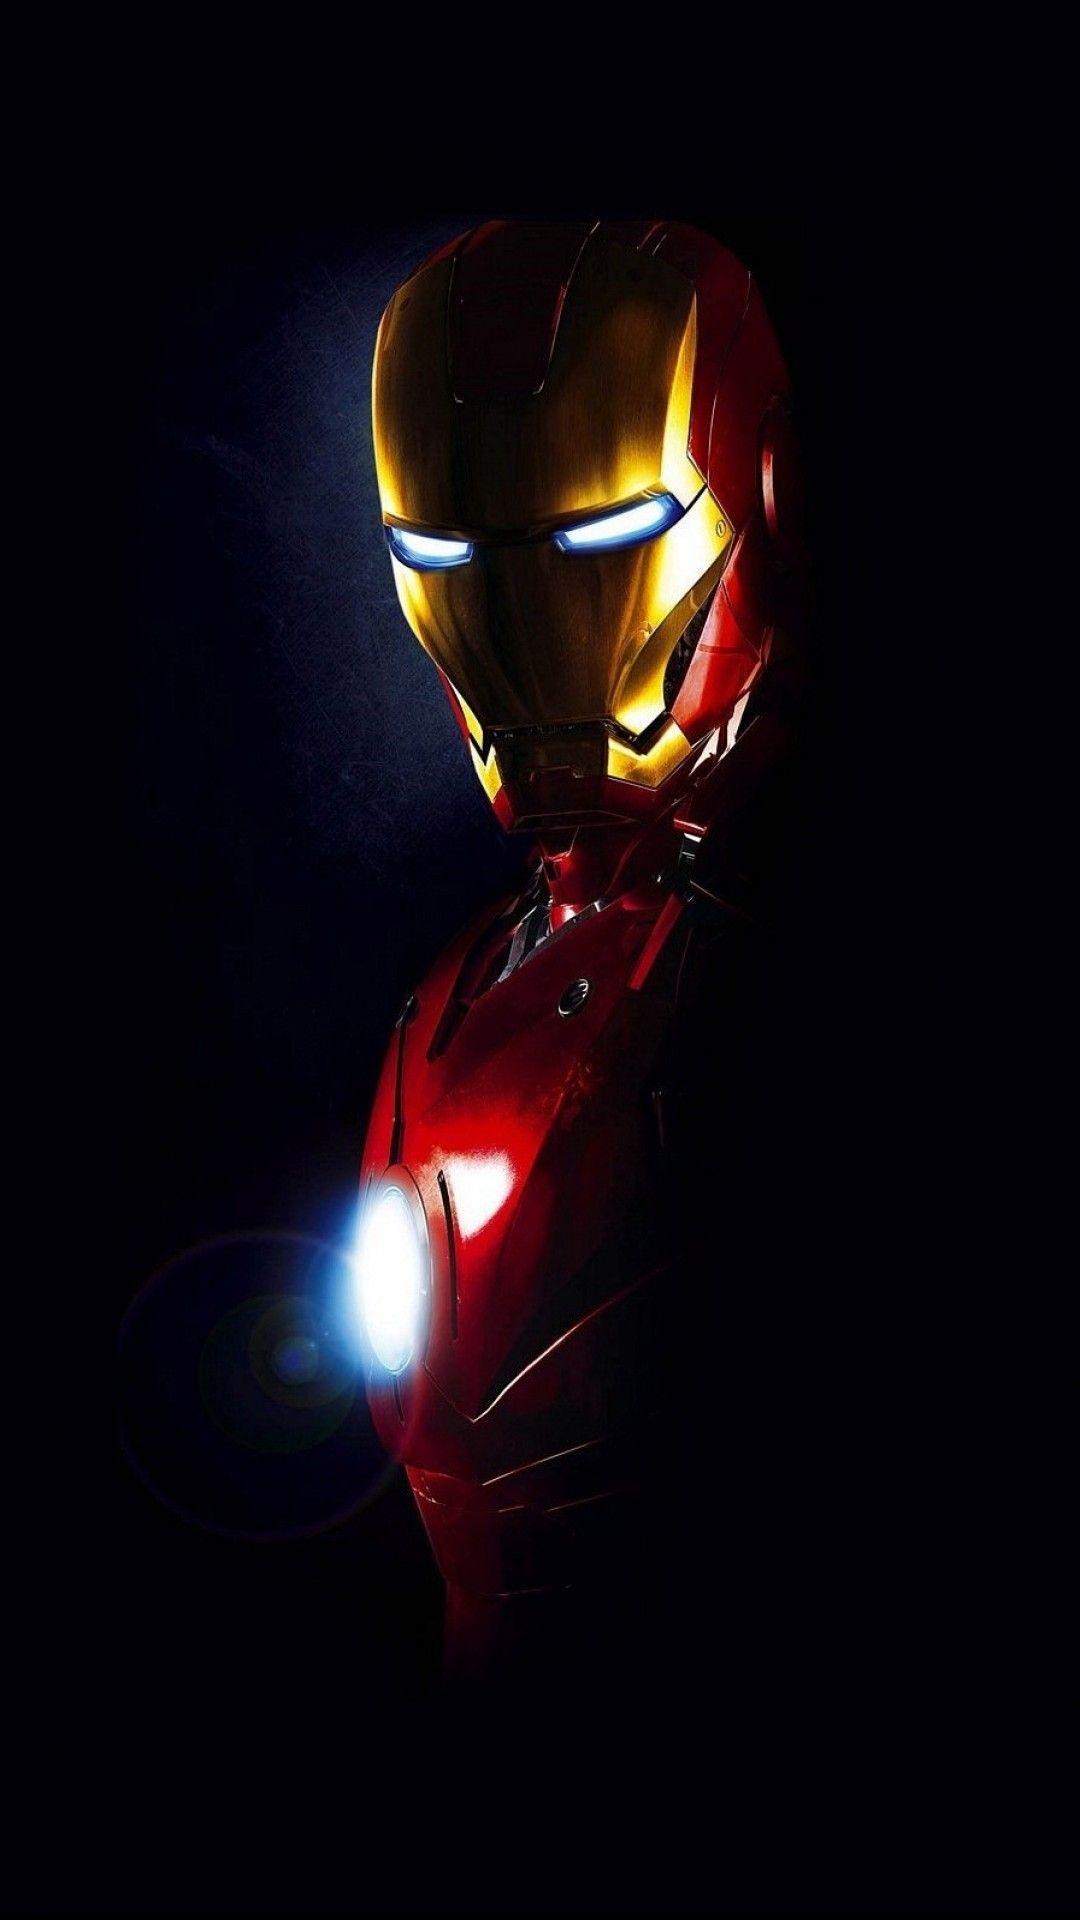 Iron Man 4k Superheroes Wallpapers Iron Man Wallpapers Hd Wallpapers 8k Wallpapers 5k Wallpapers Iron Man Wallpaper Iron Man Hd Wallpaper Man Wallpaper